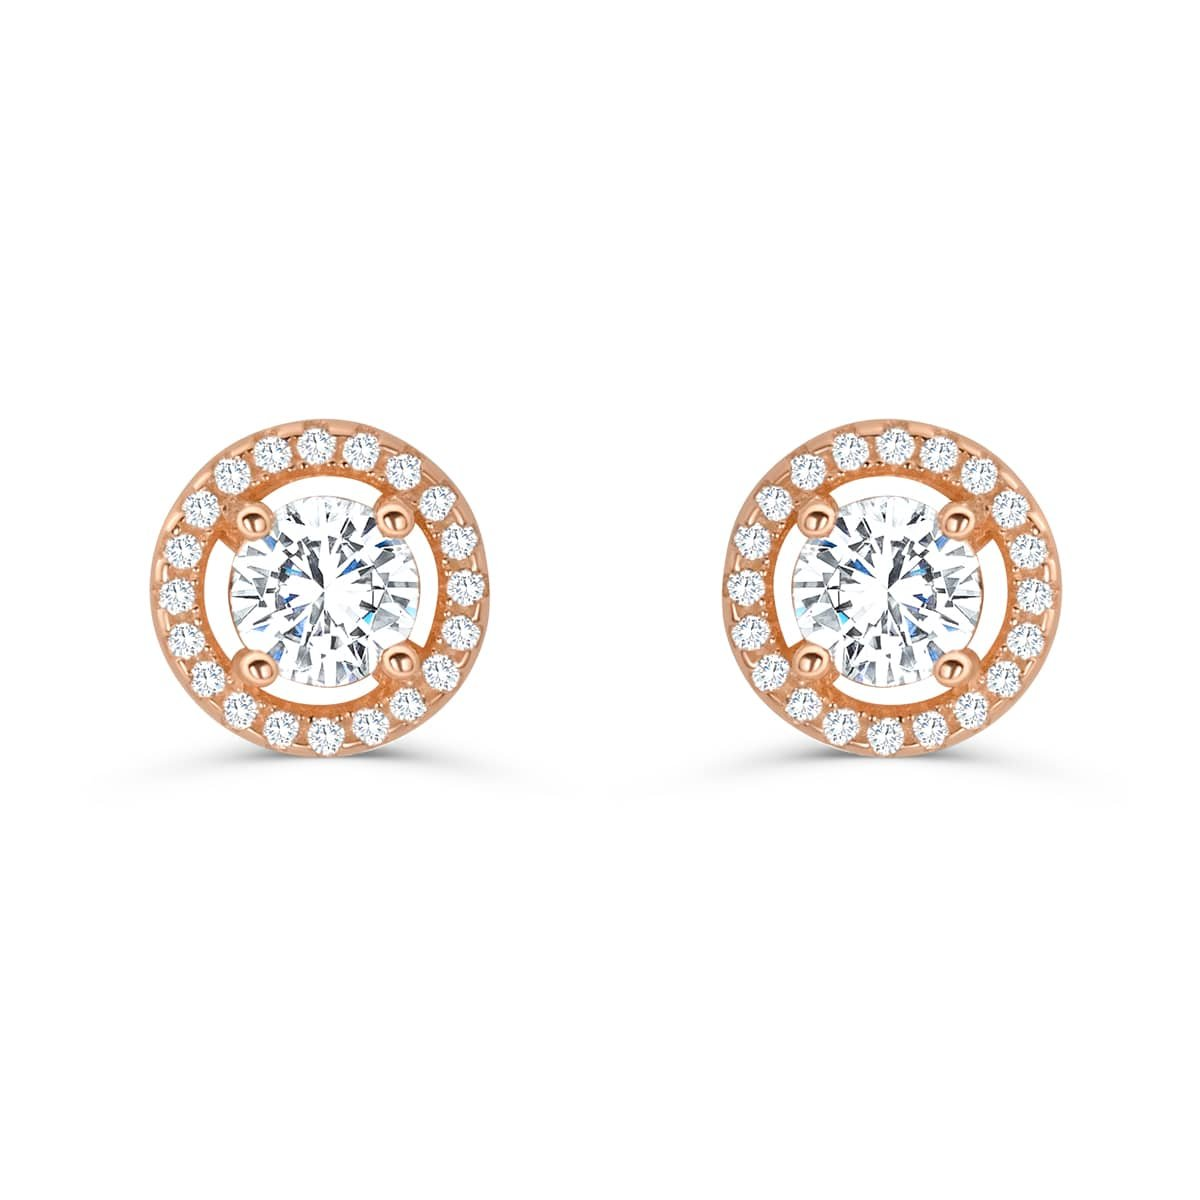 Amazon.com  Stunning Rose Gold Plated Sterling Silver CZ Earrings Stud -  Silver Earrings For Women  Jewelry 2e8fbd19dd